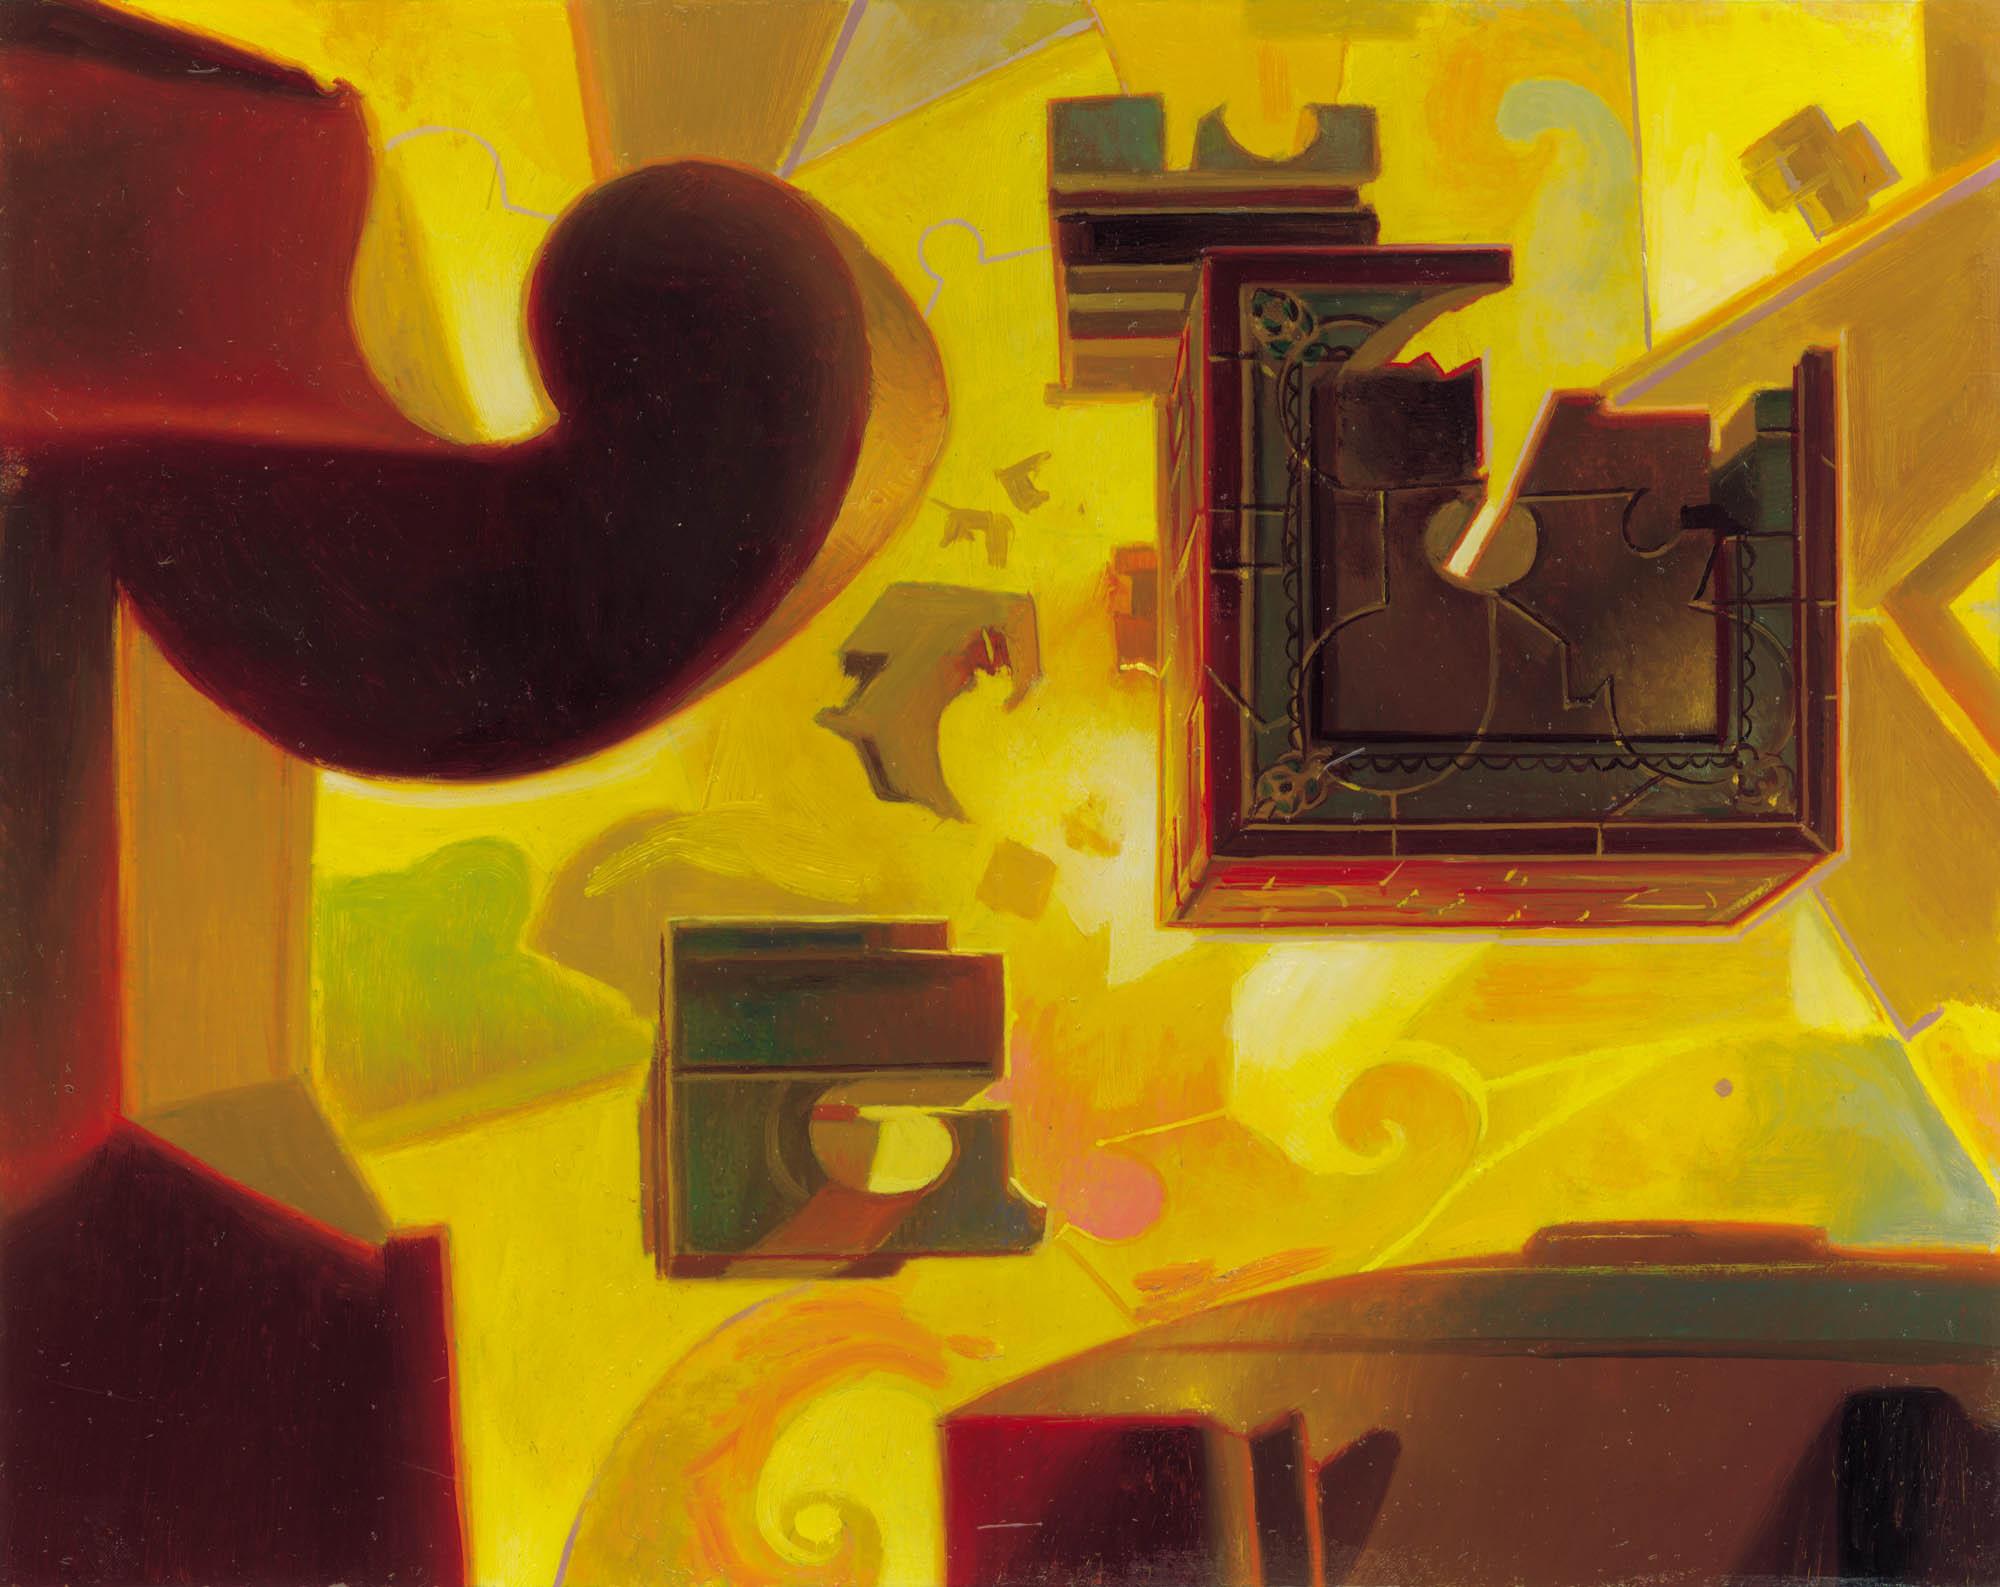 Teferi's Puzzle Box MTG card art by Donato Giancola